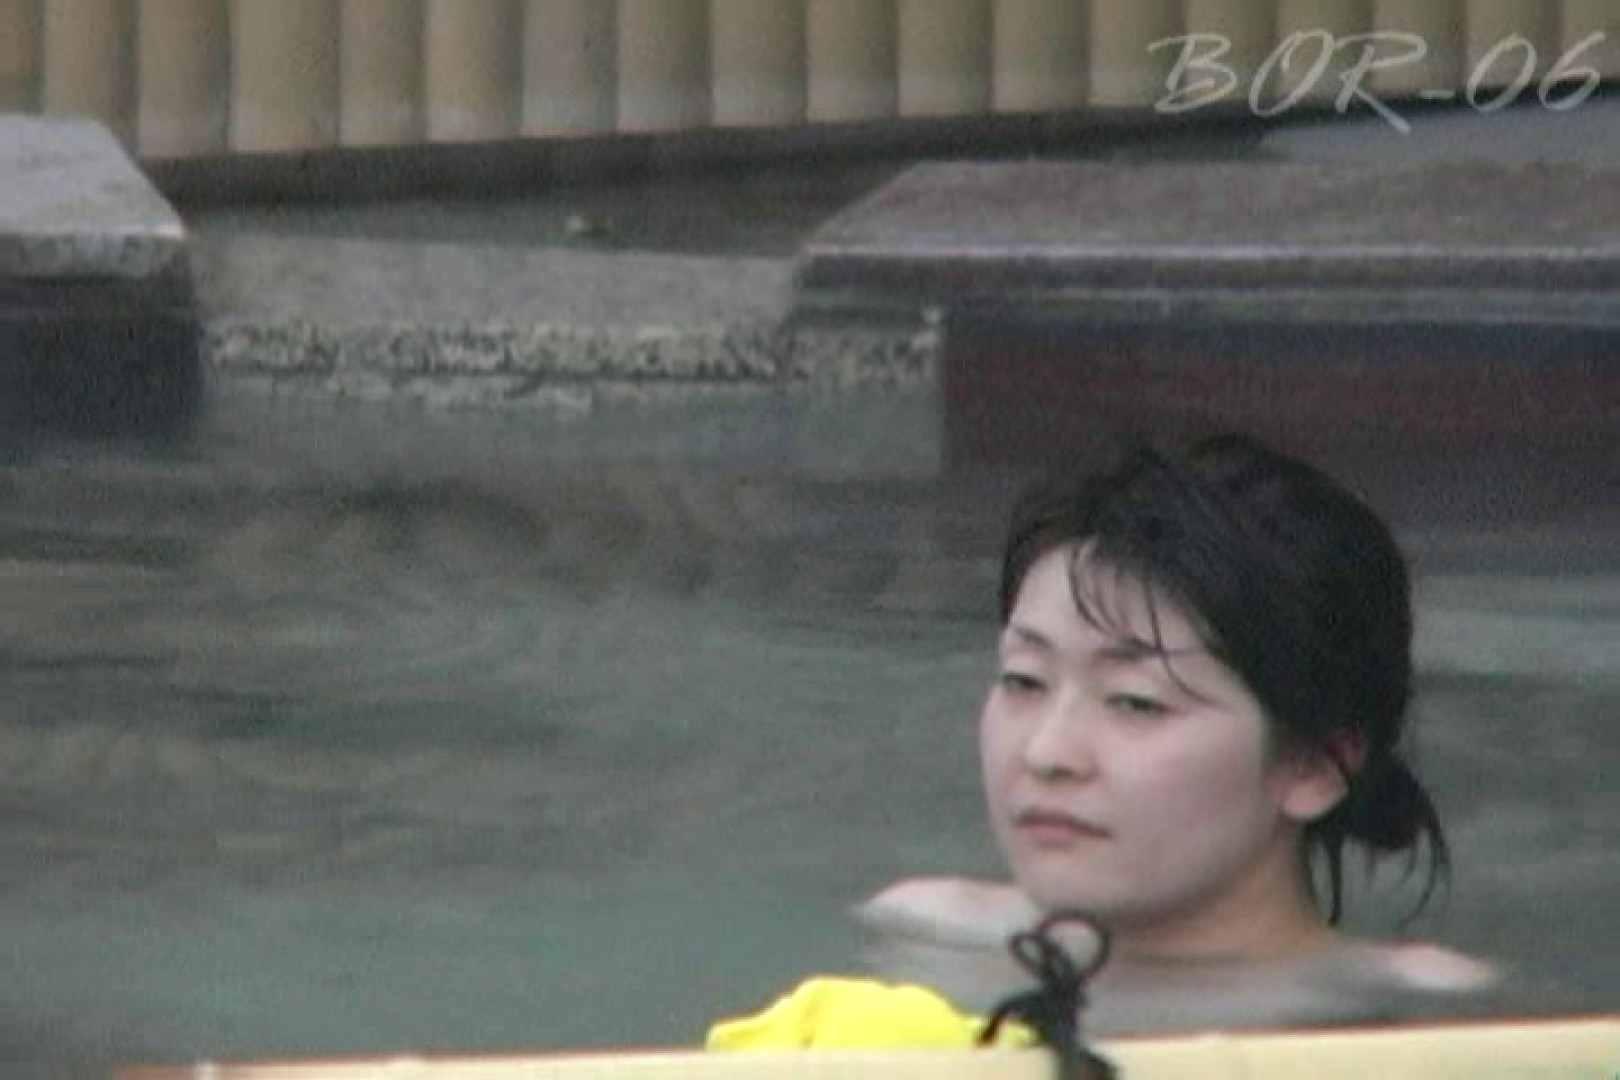 Aquaな露天風呂Vol.523 盗撮映像  93Pix 81